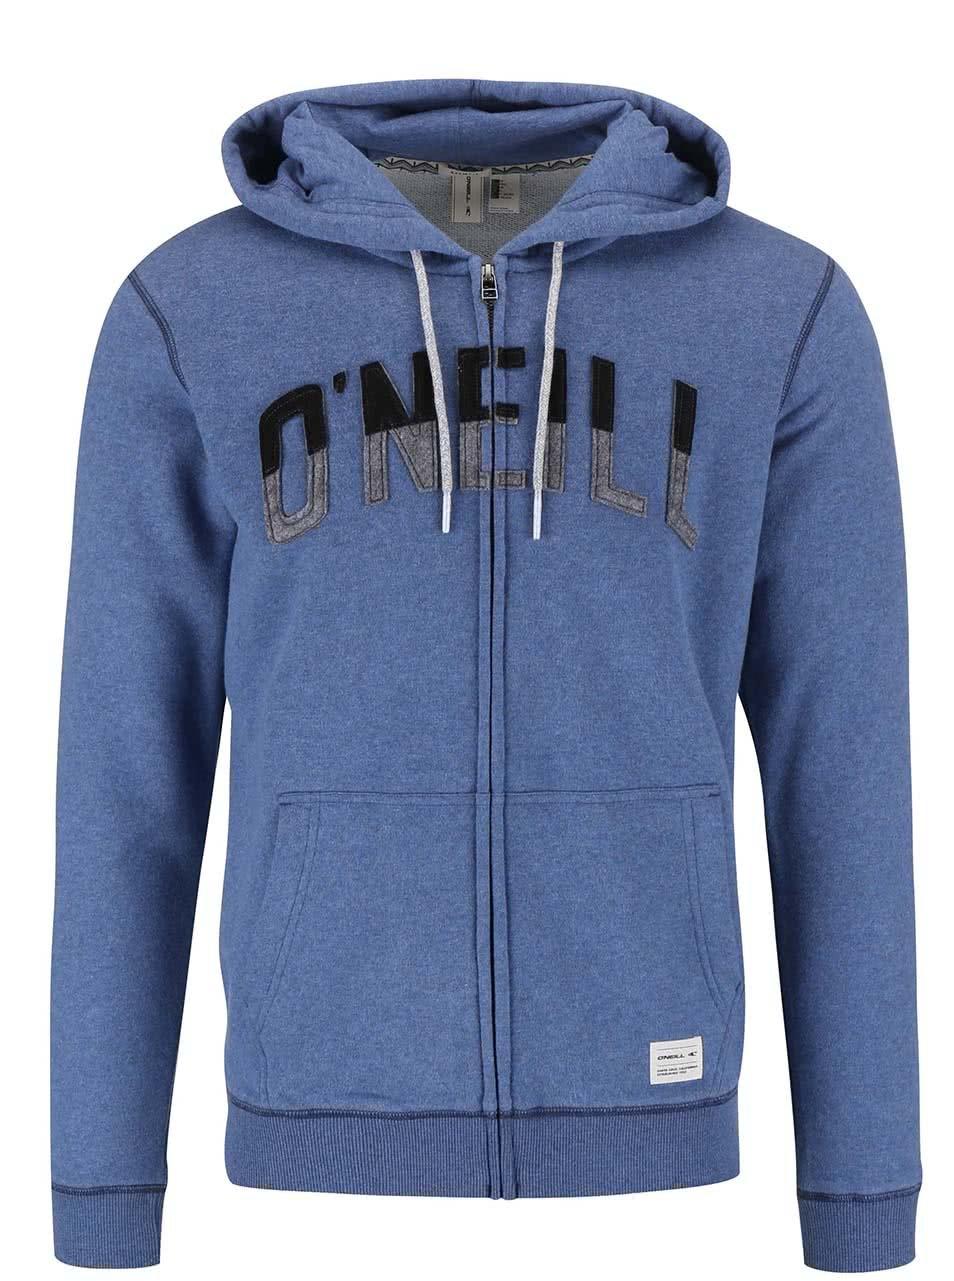 Modrá pánska mikina na zips O Neill PCH FULL ZIP ... 8020f3b3377